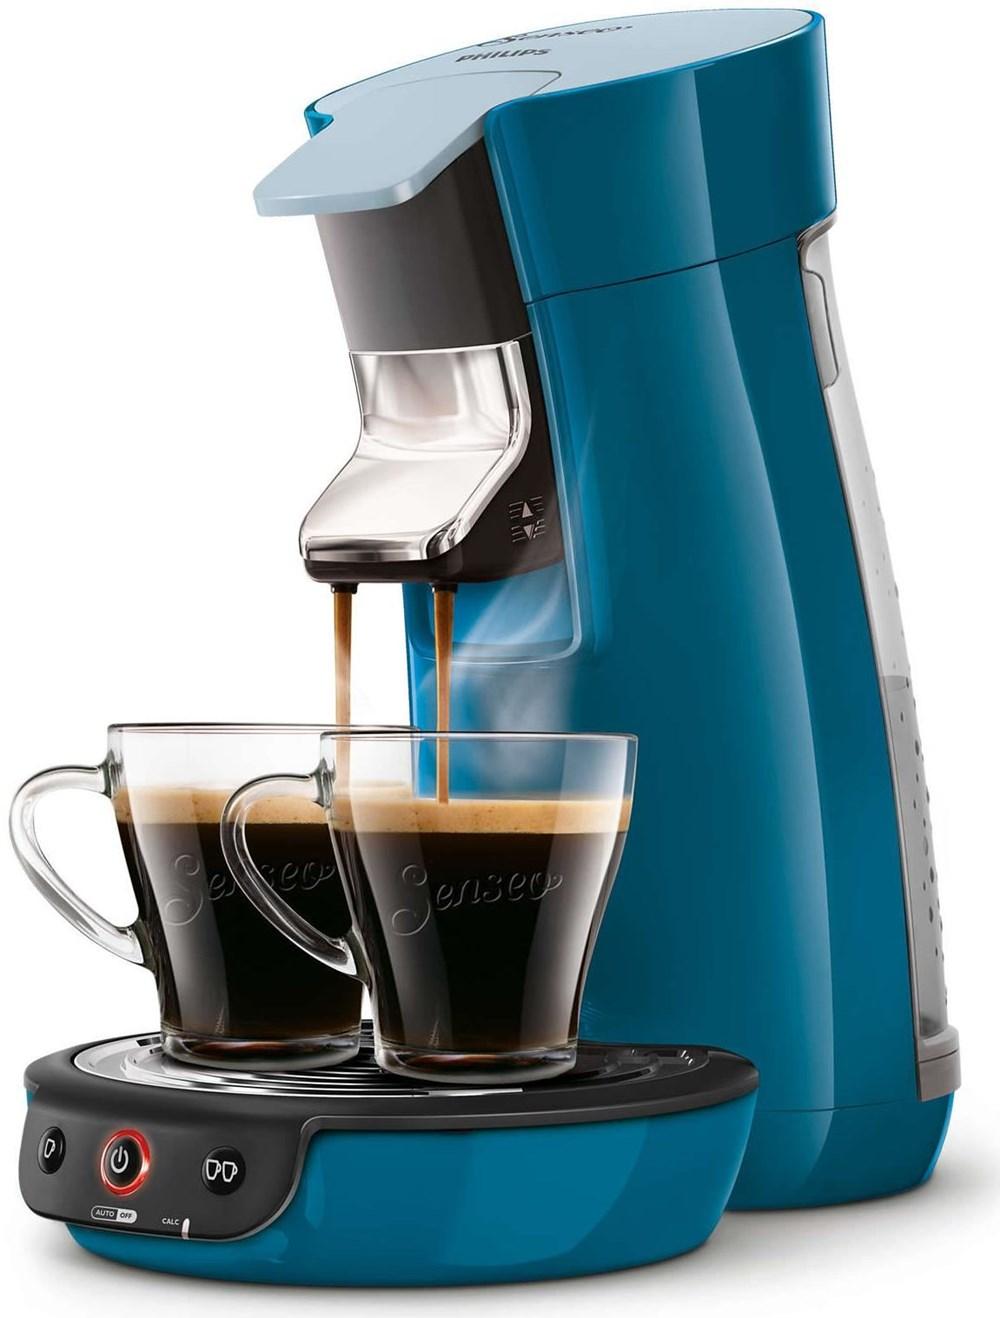 Philips Coffee Maker Pods : Philips HD7829/70 Senseo Viva Cafe turkis - Coffee Pod / Capsule Machines - computeruniverse